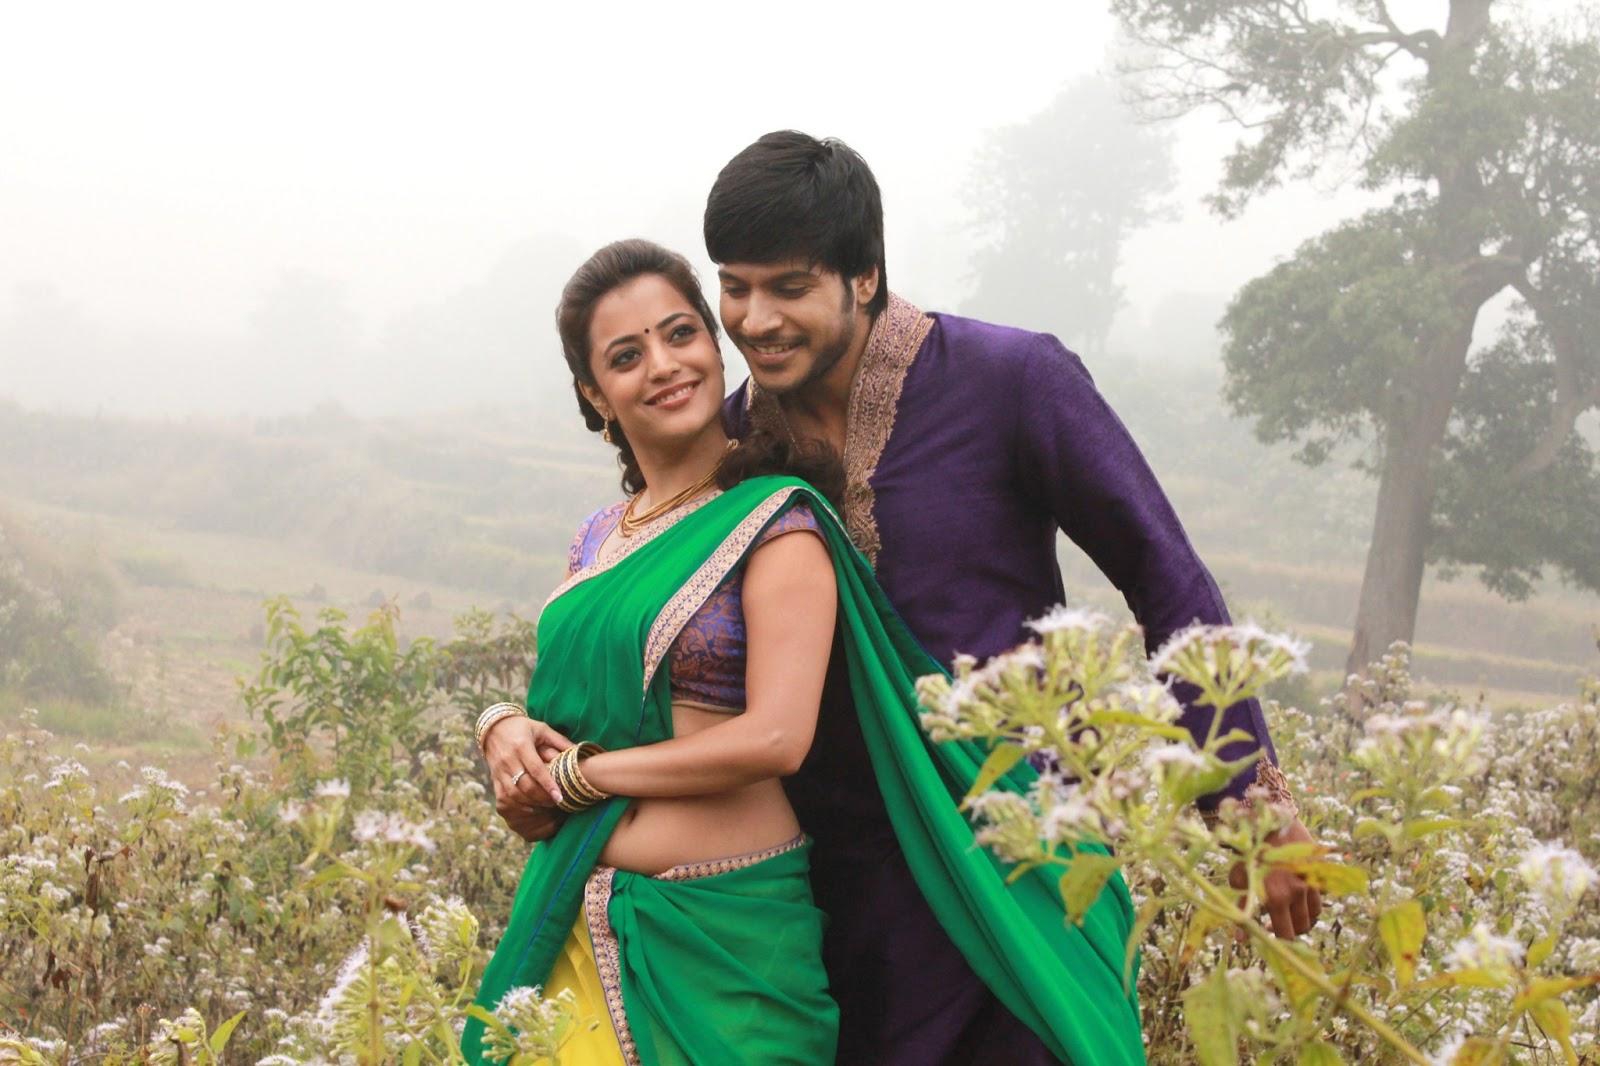 DK-Bose-Movie-Stills-Sundeep-Kishan-Nisha-Aggarwal-http-pjmaja-blogspot-in-dk-bose-mo-wallpaper-wp4605428